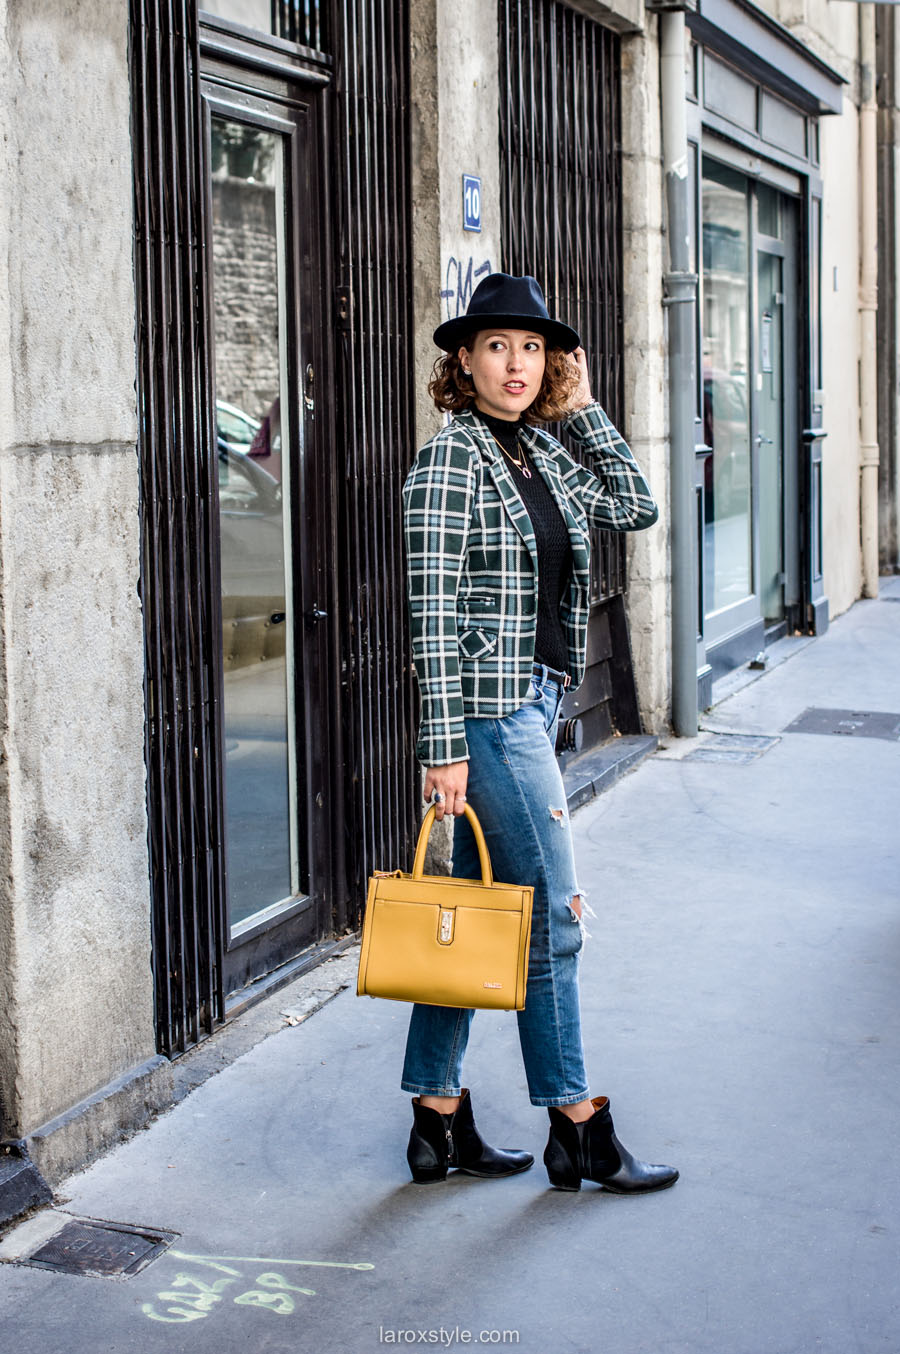 bristish style - veste a carreaux - look jean troue - laroxstyle blog mode lyon-16